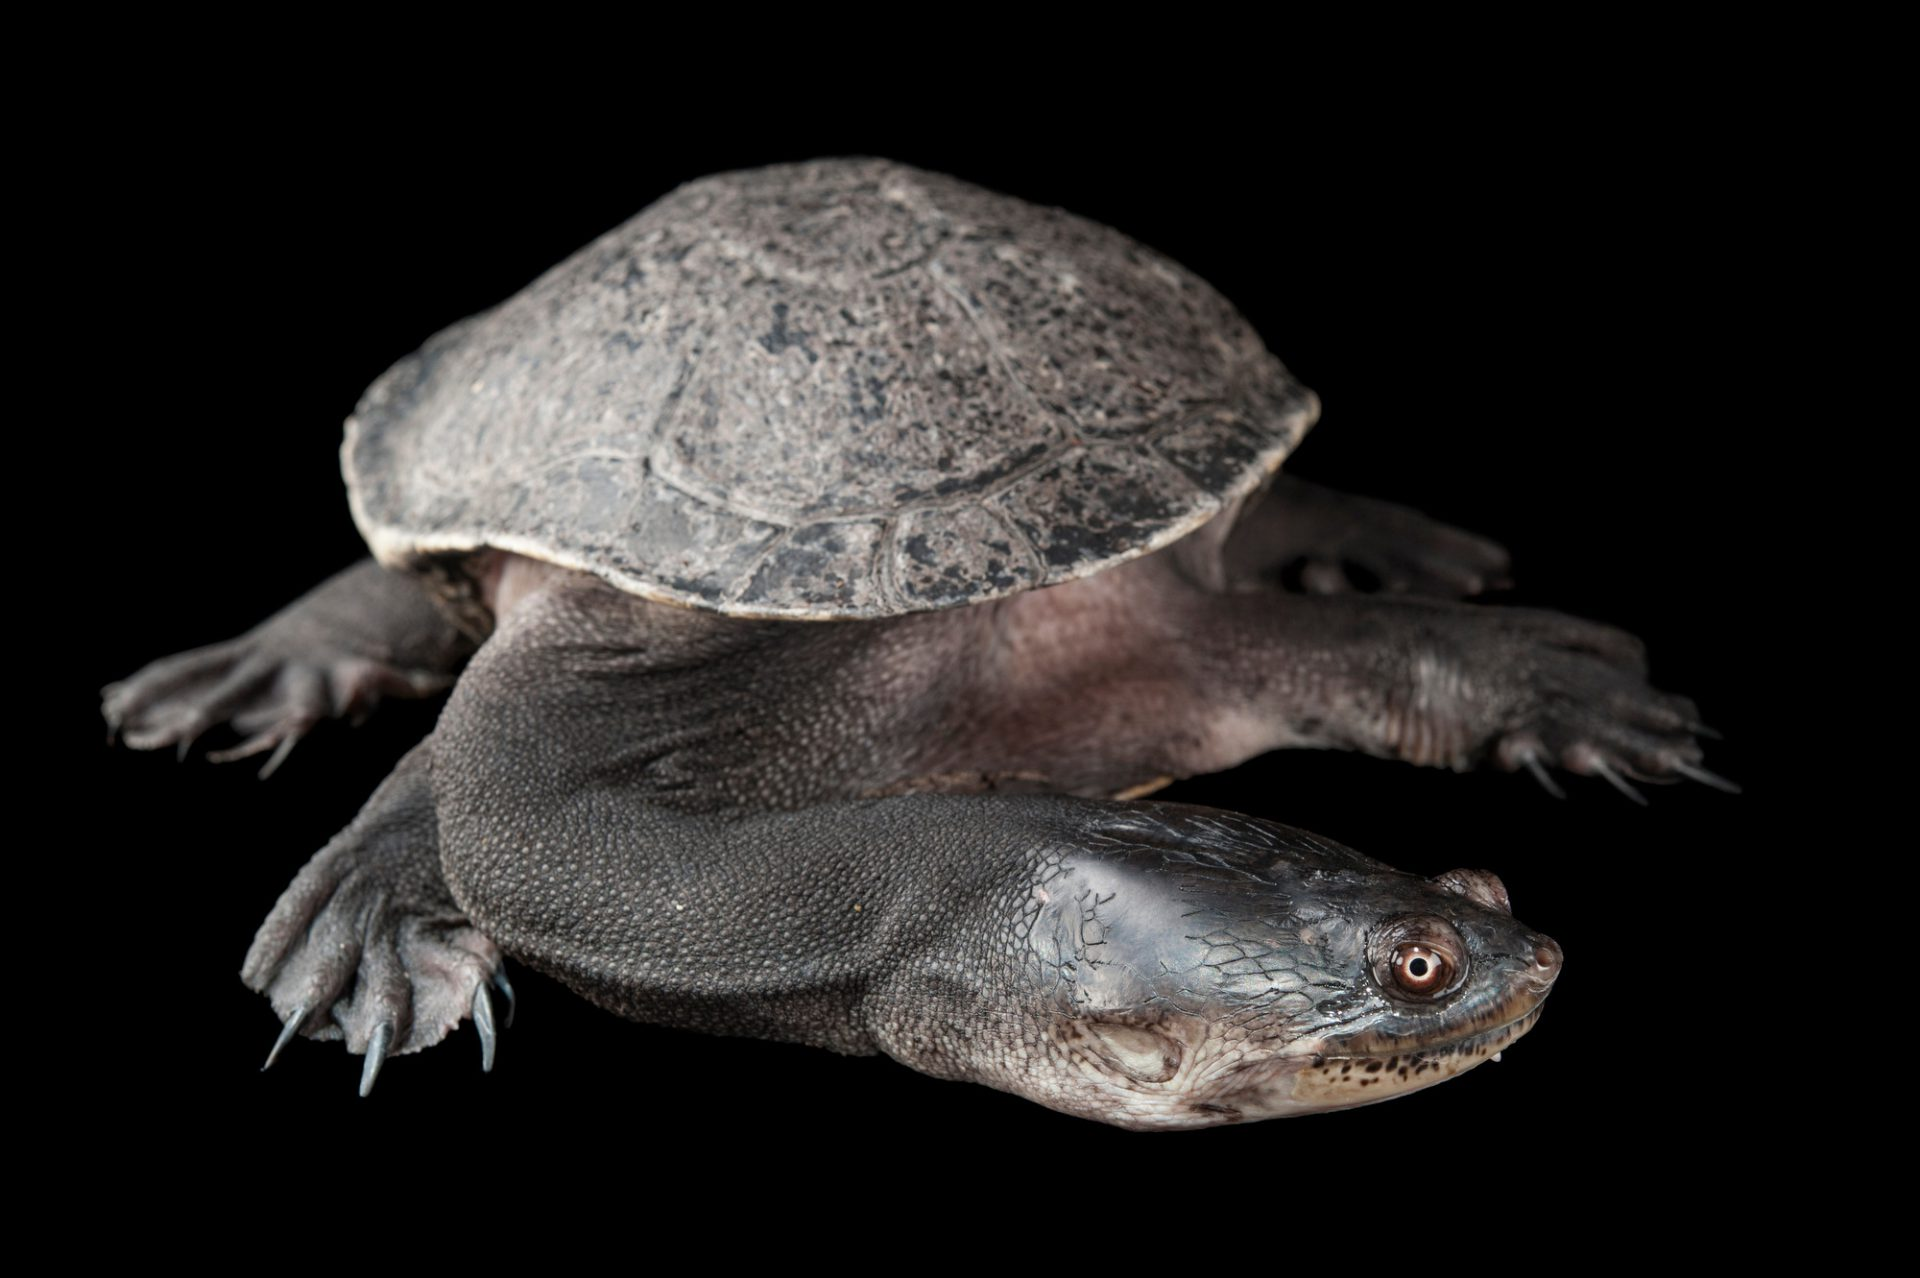 North Australian snake-necked turtle (Chelodina rugosa) at the Omaha Zoo.